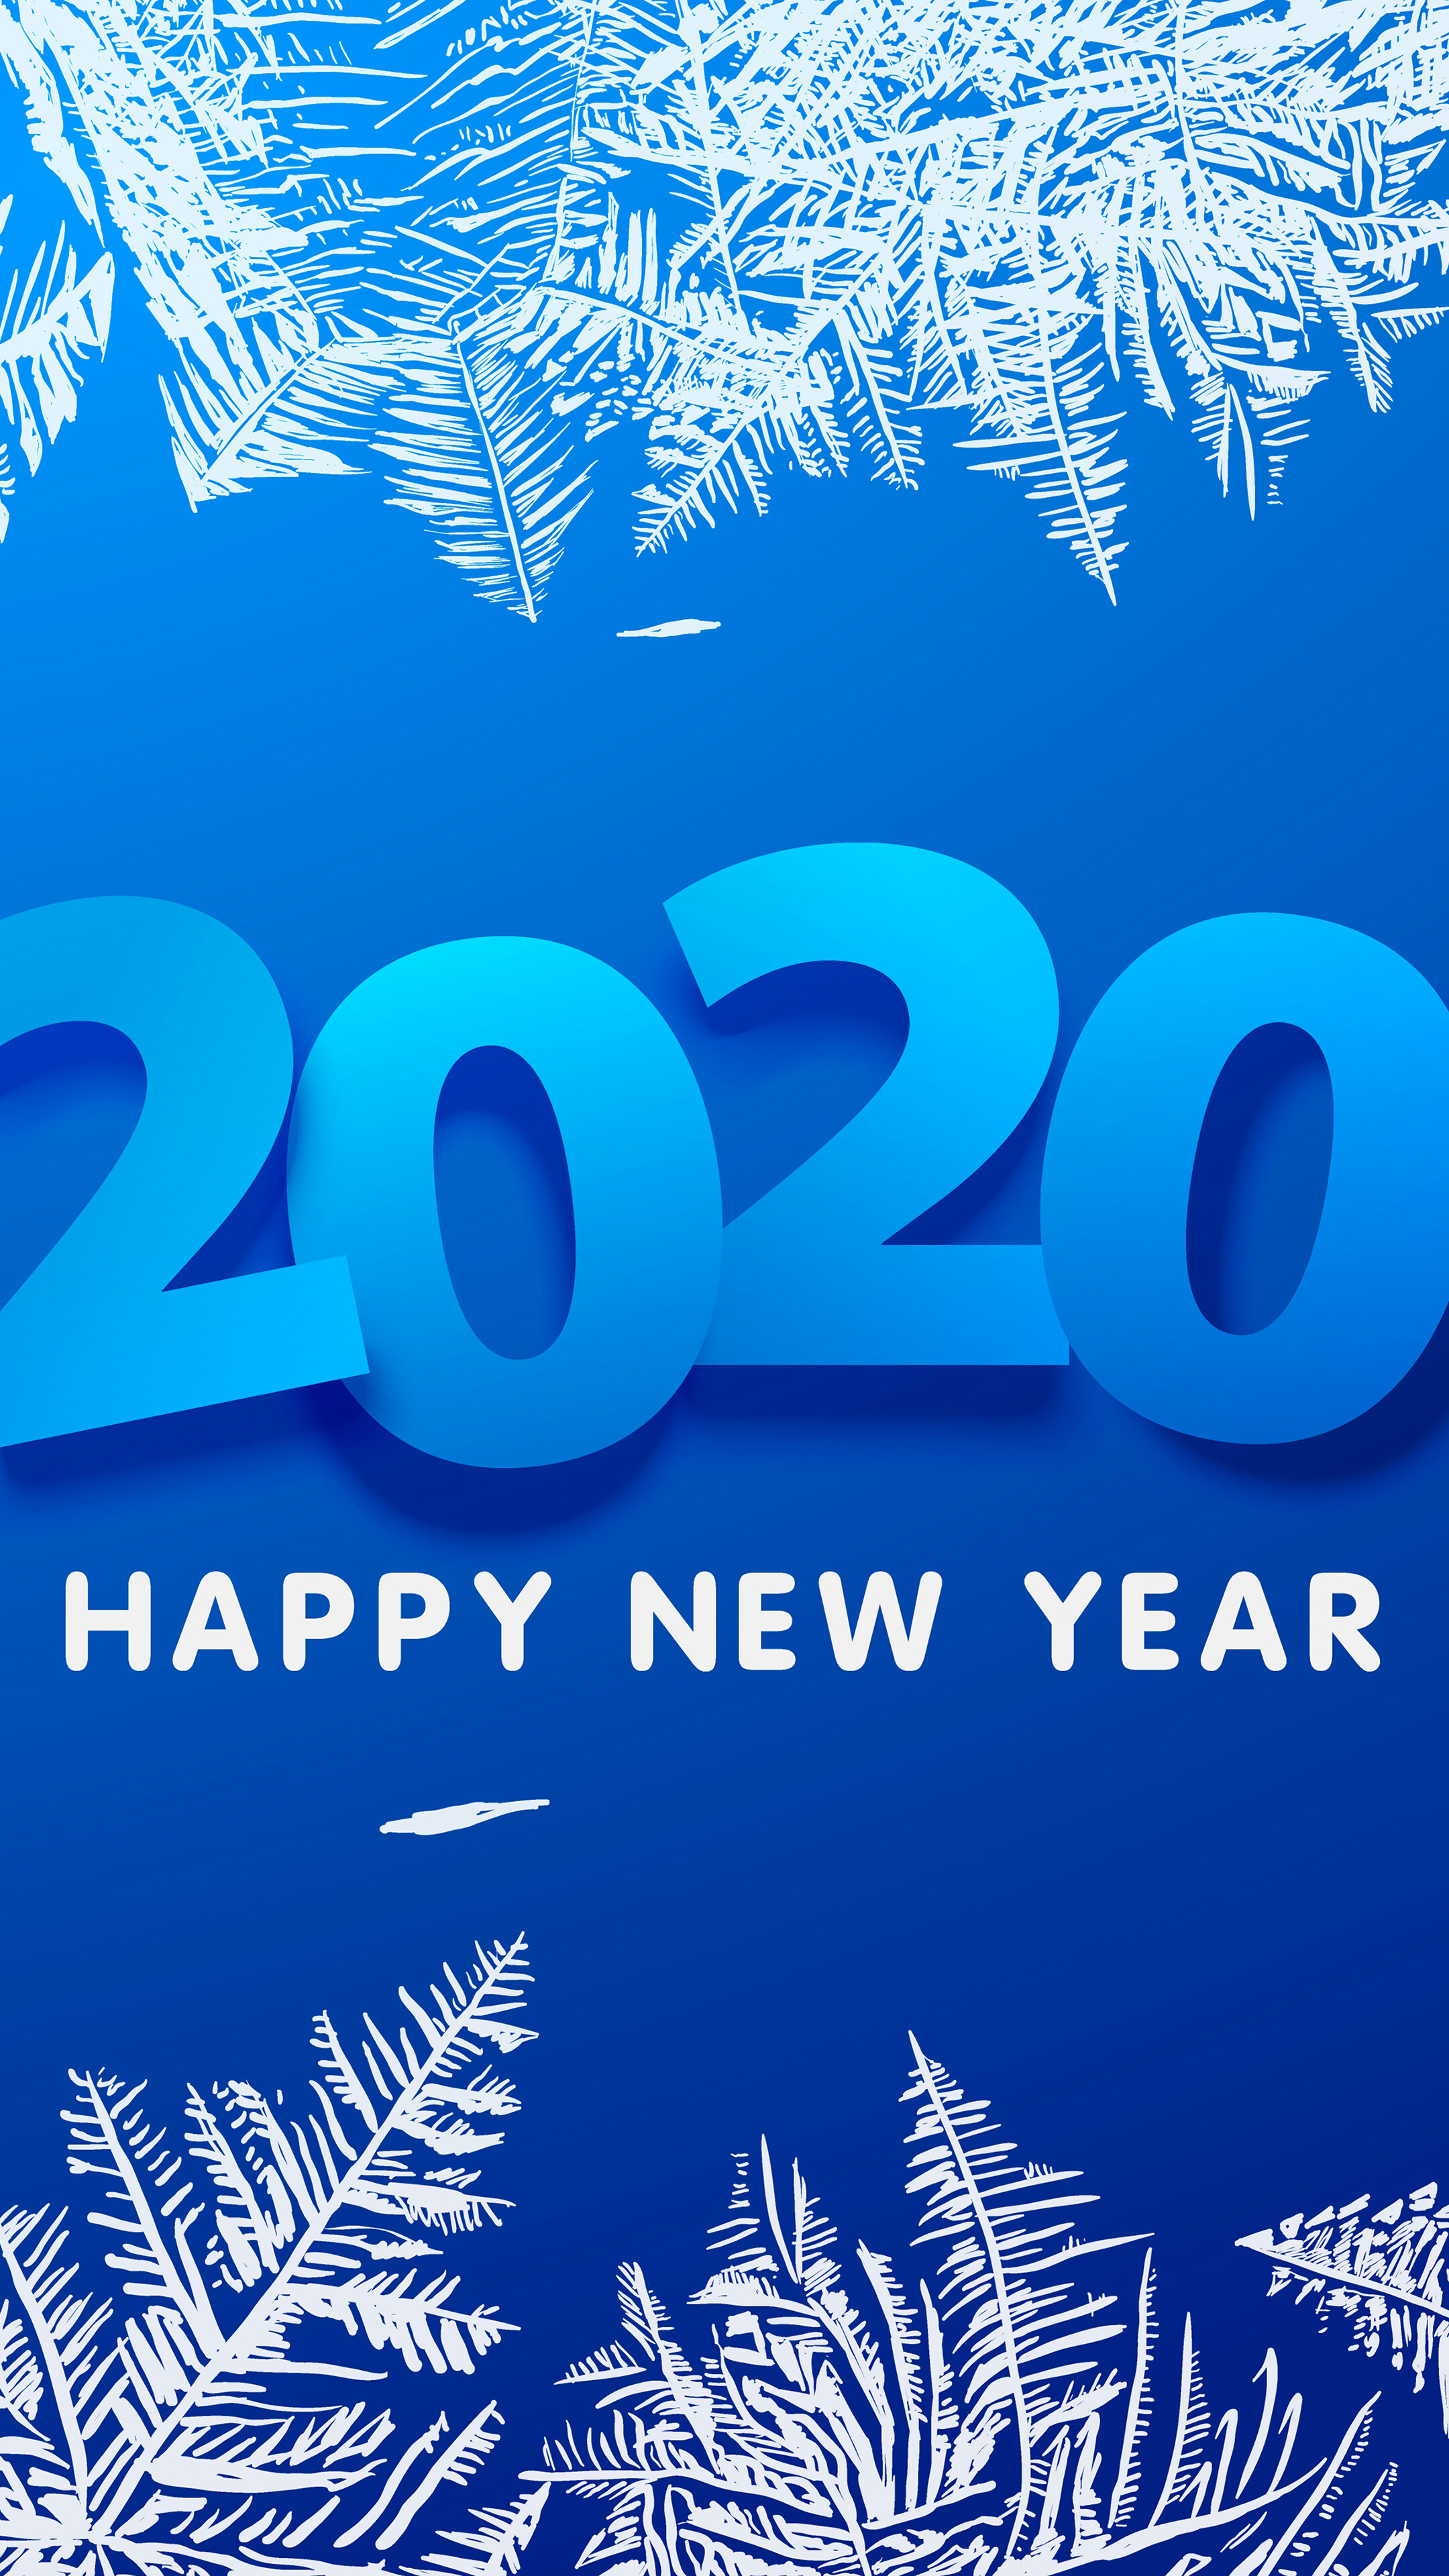 2020 Happy New Year 8K Wallpaper 42309 2160x3840